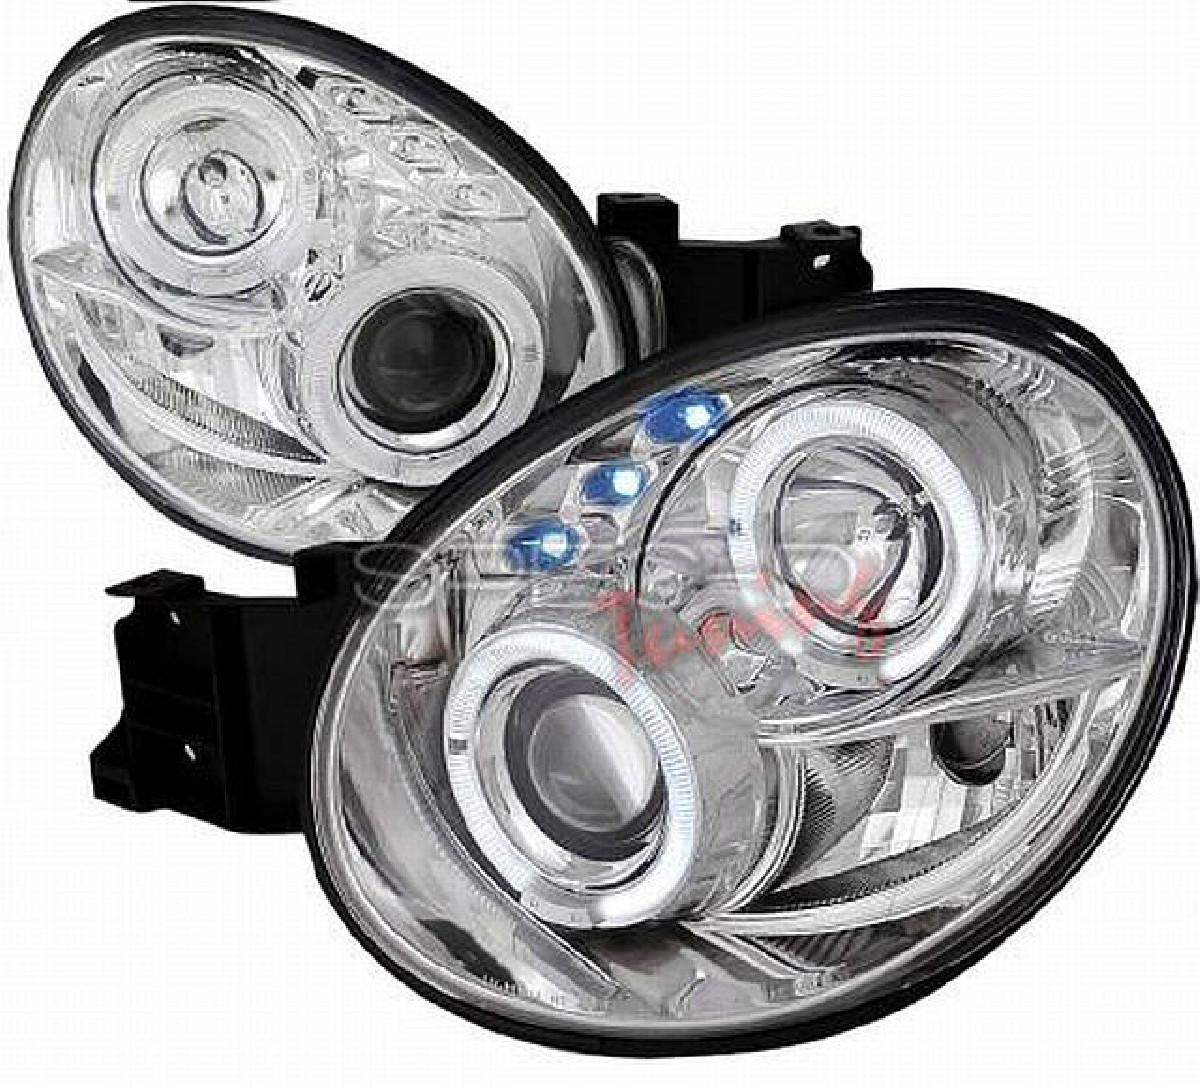 LED Tagfahrlicht Scheinwerfer Subaru Impreza GD A 00-02 Klar